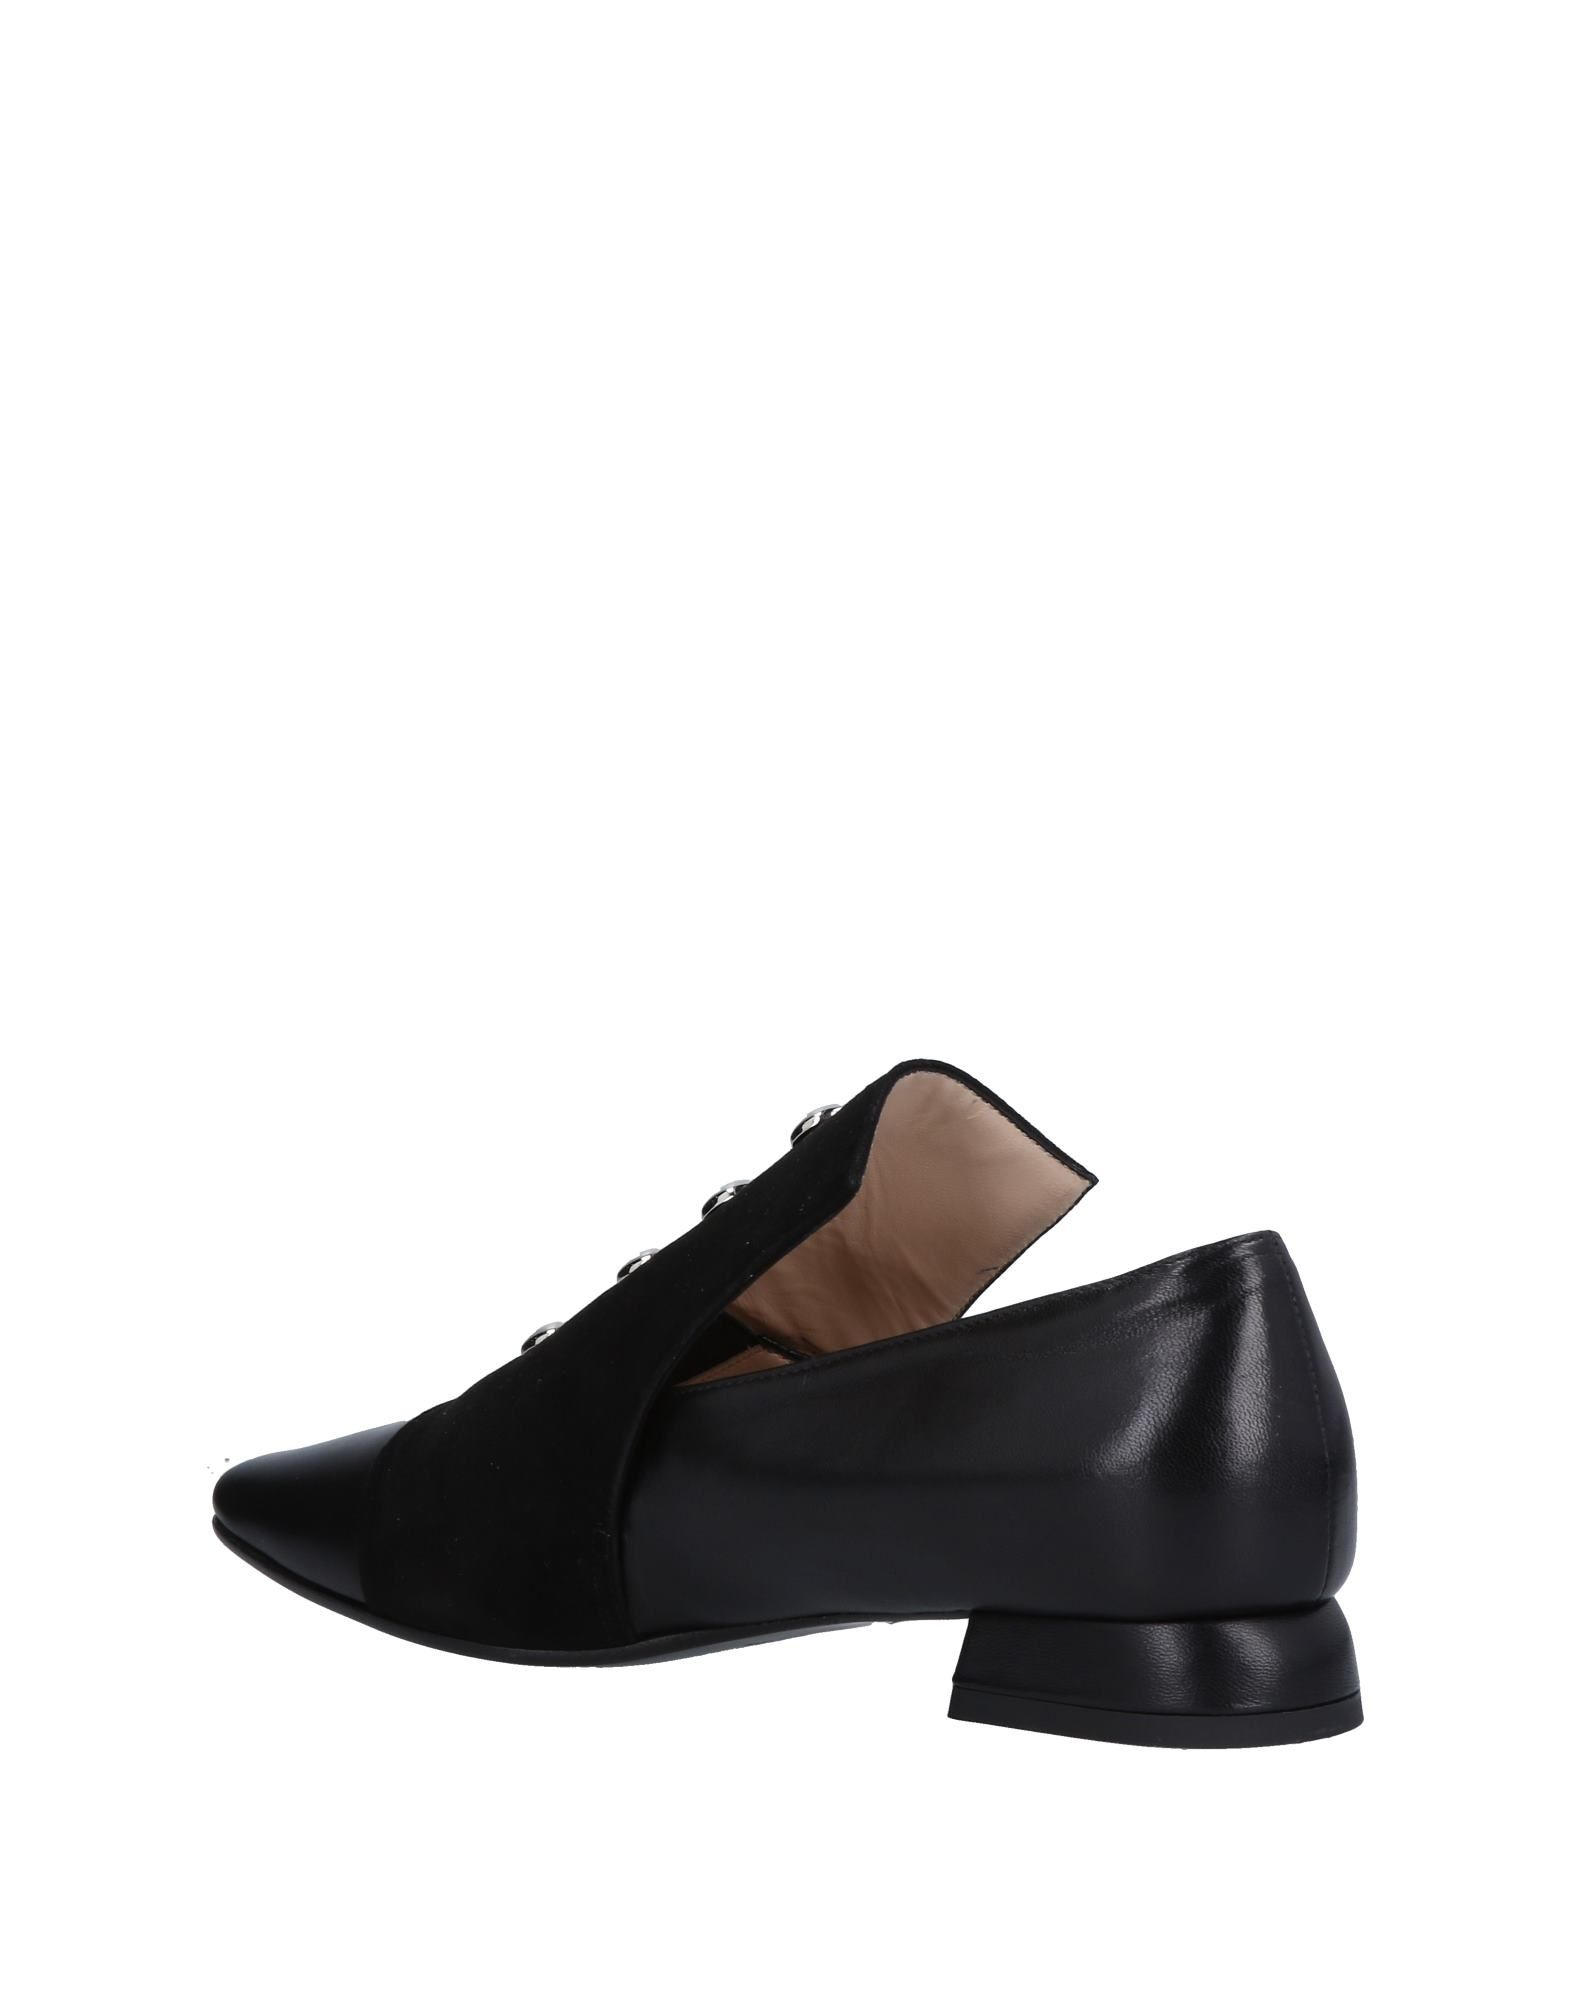 Marie Elodie Mokassins Damen  11502770KB Gute Schuhe Qualität beliebte Schuhe Gute 236343